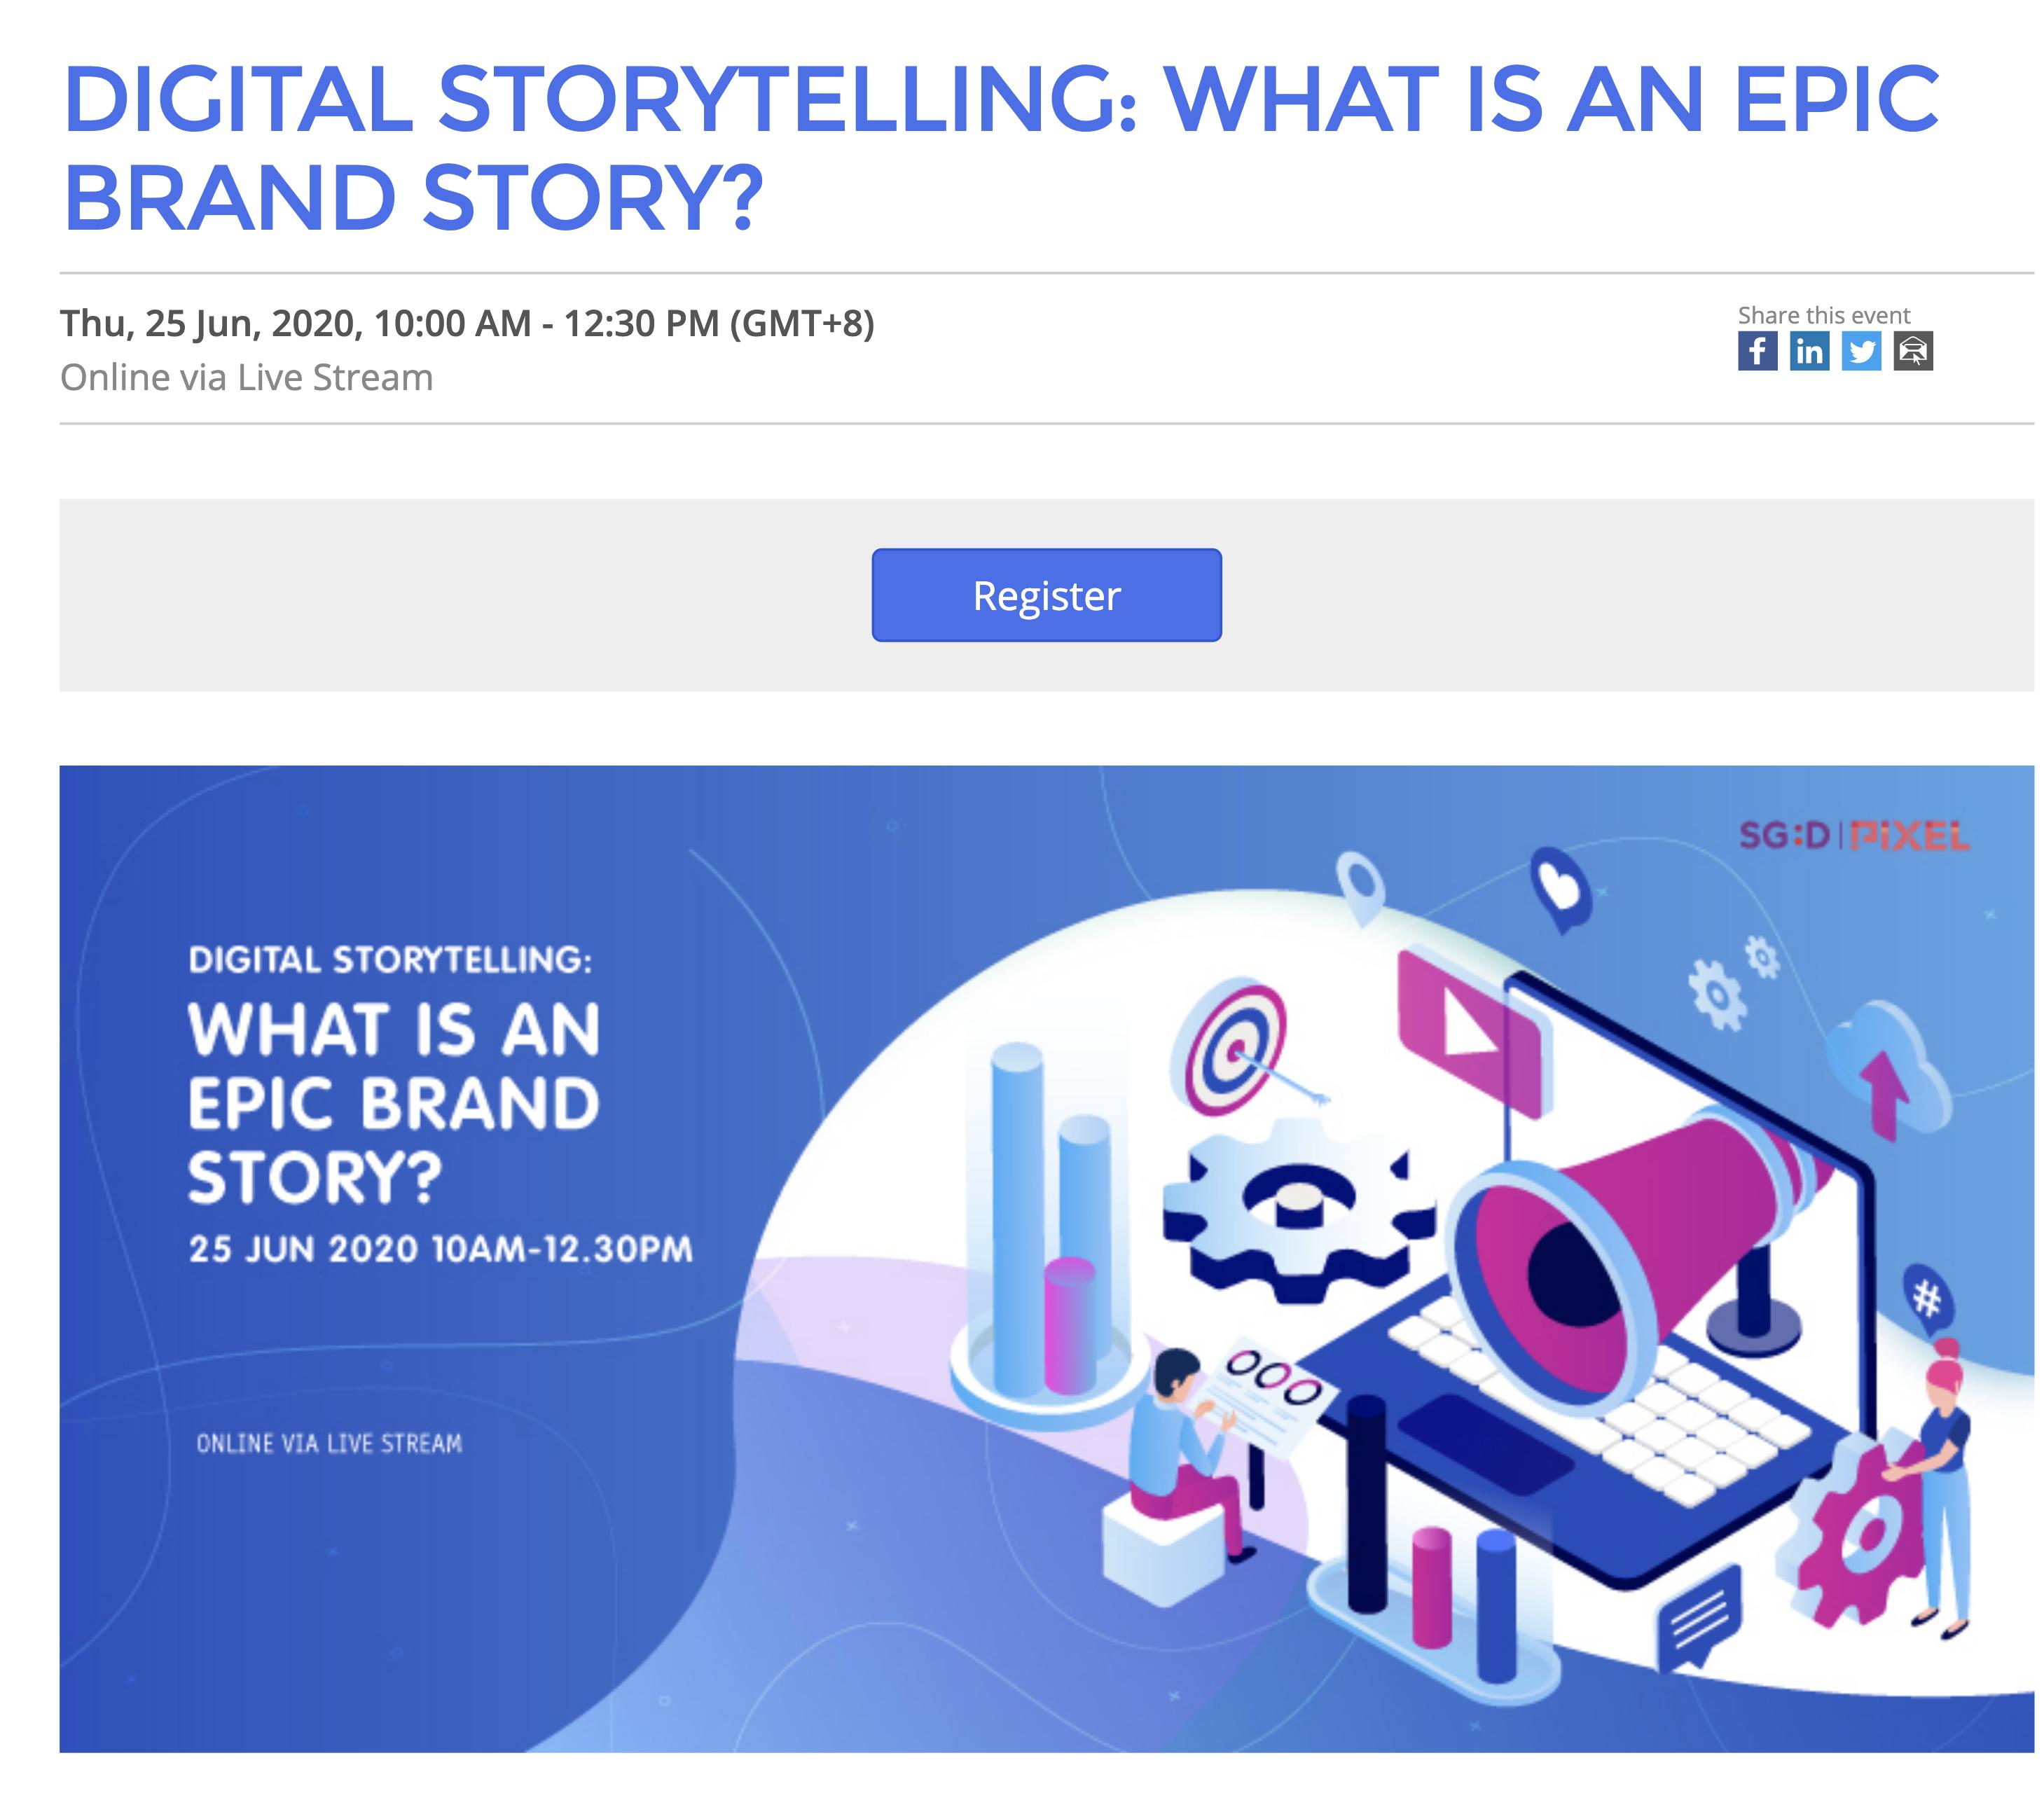 IMDA brand story telling